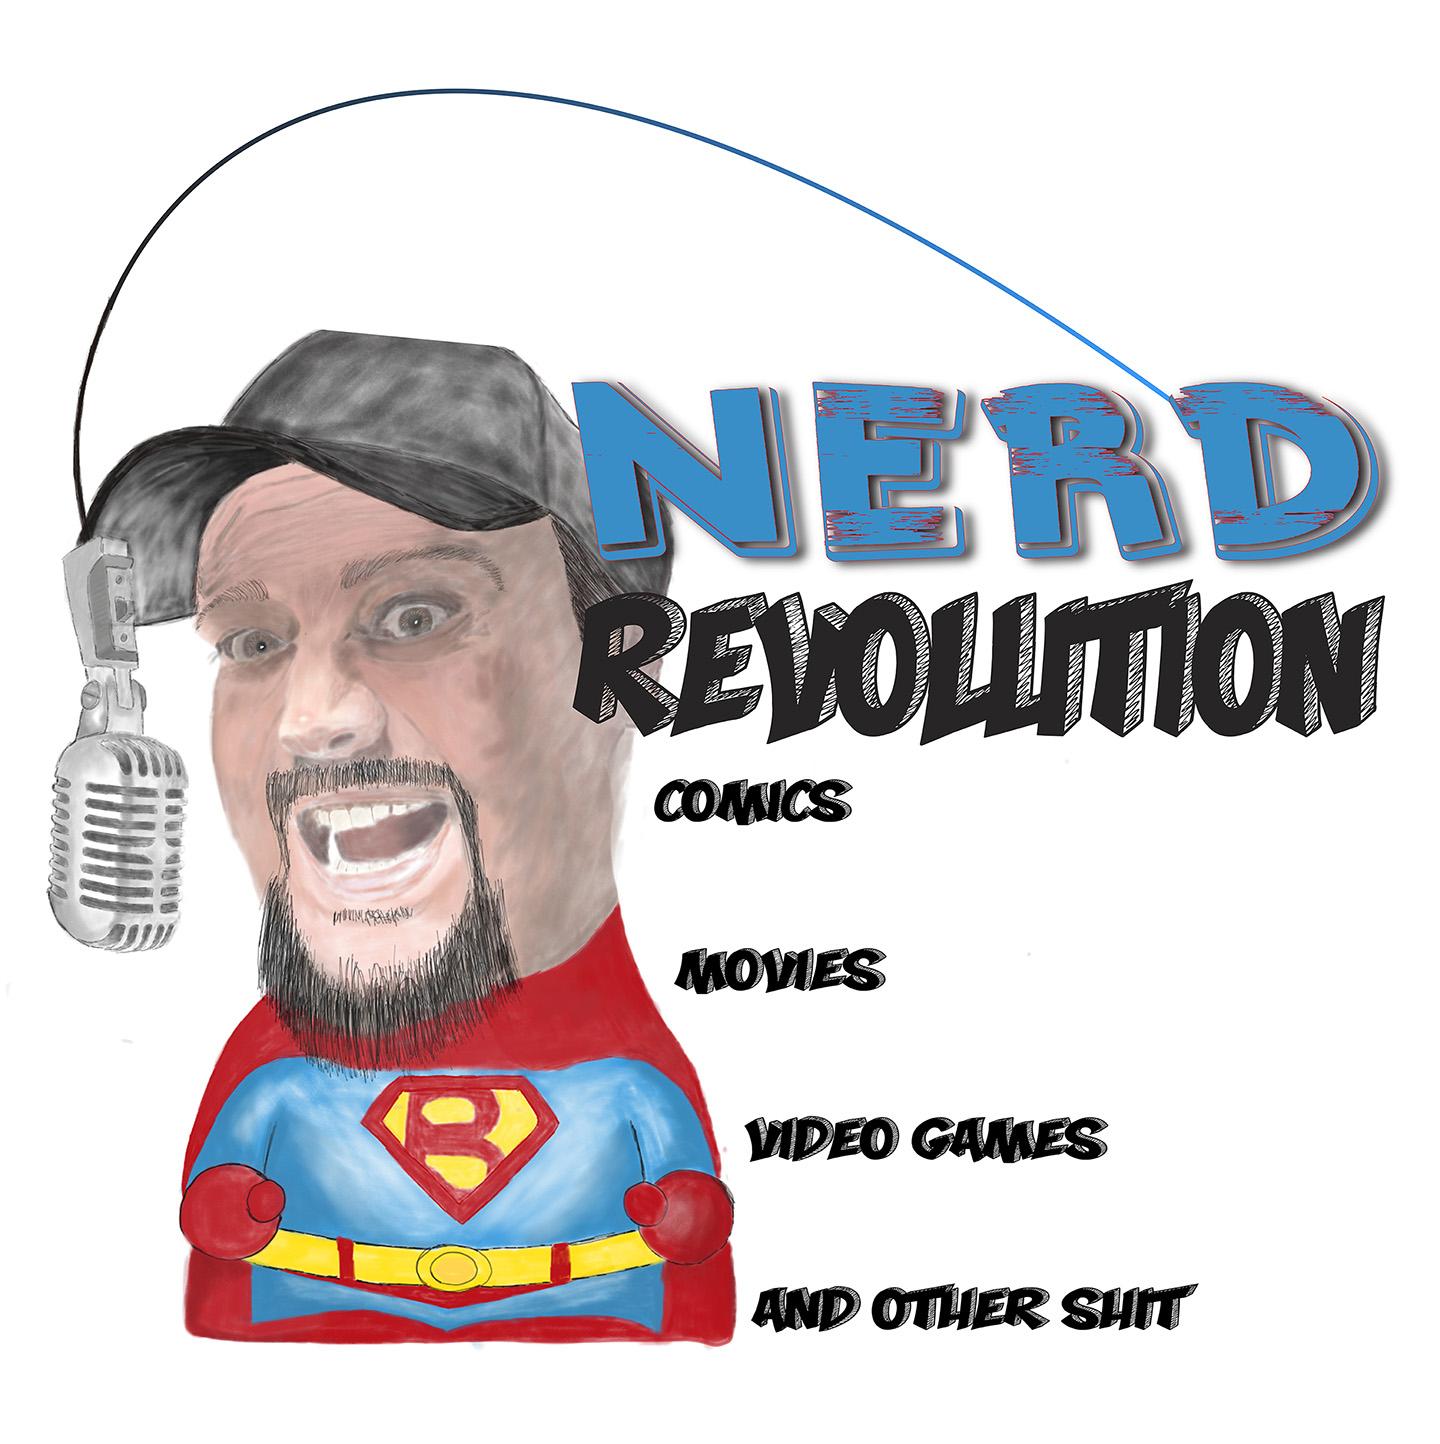 Nerd Revolution! Podcast - Listen, Reviews, Charts - Chartable